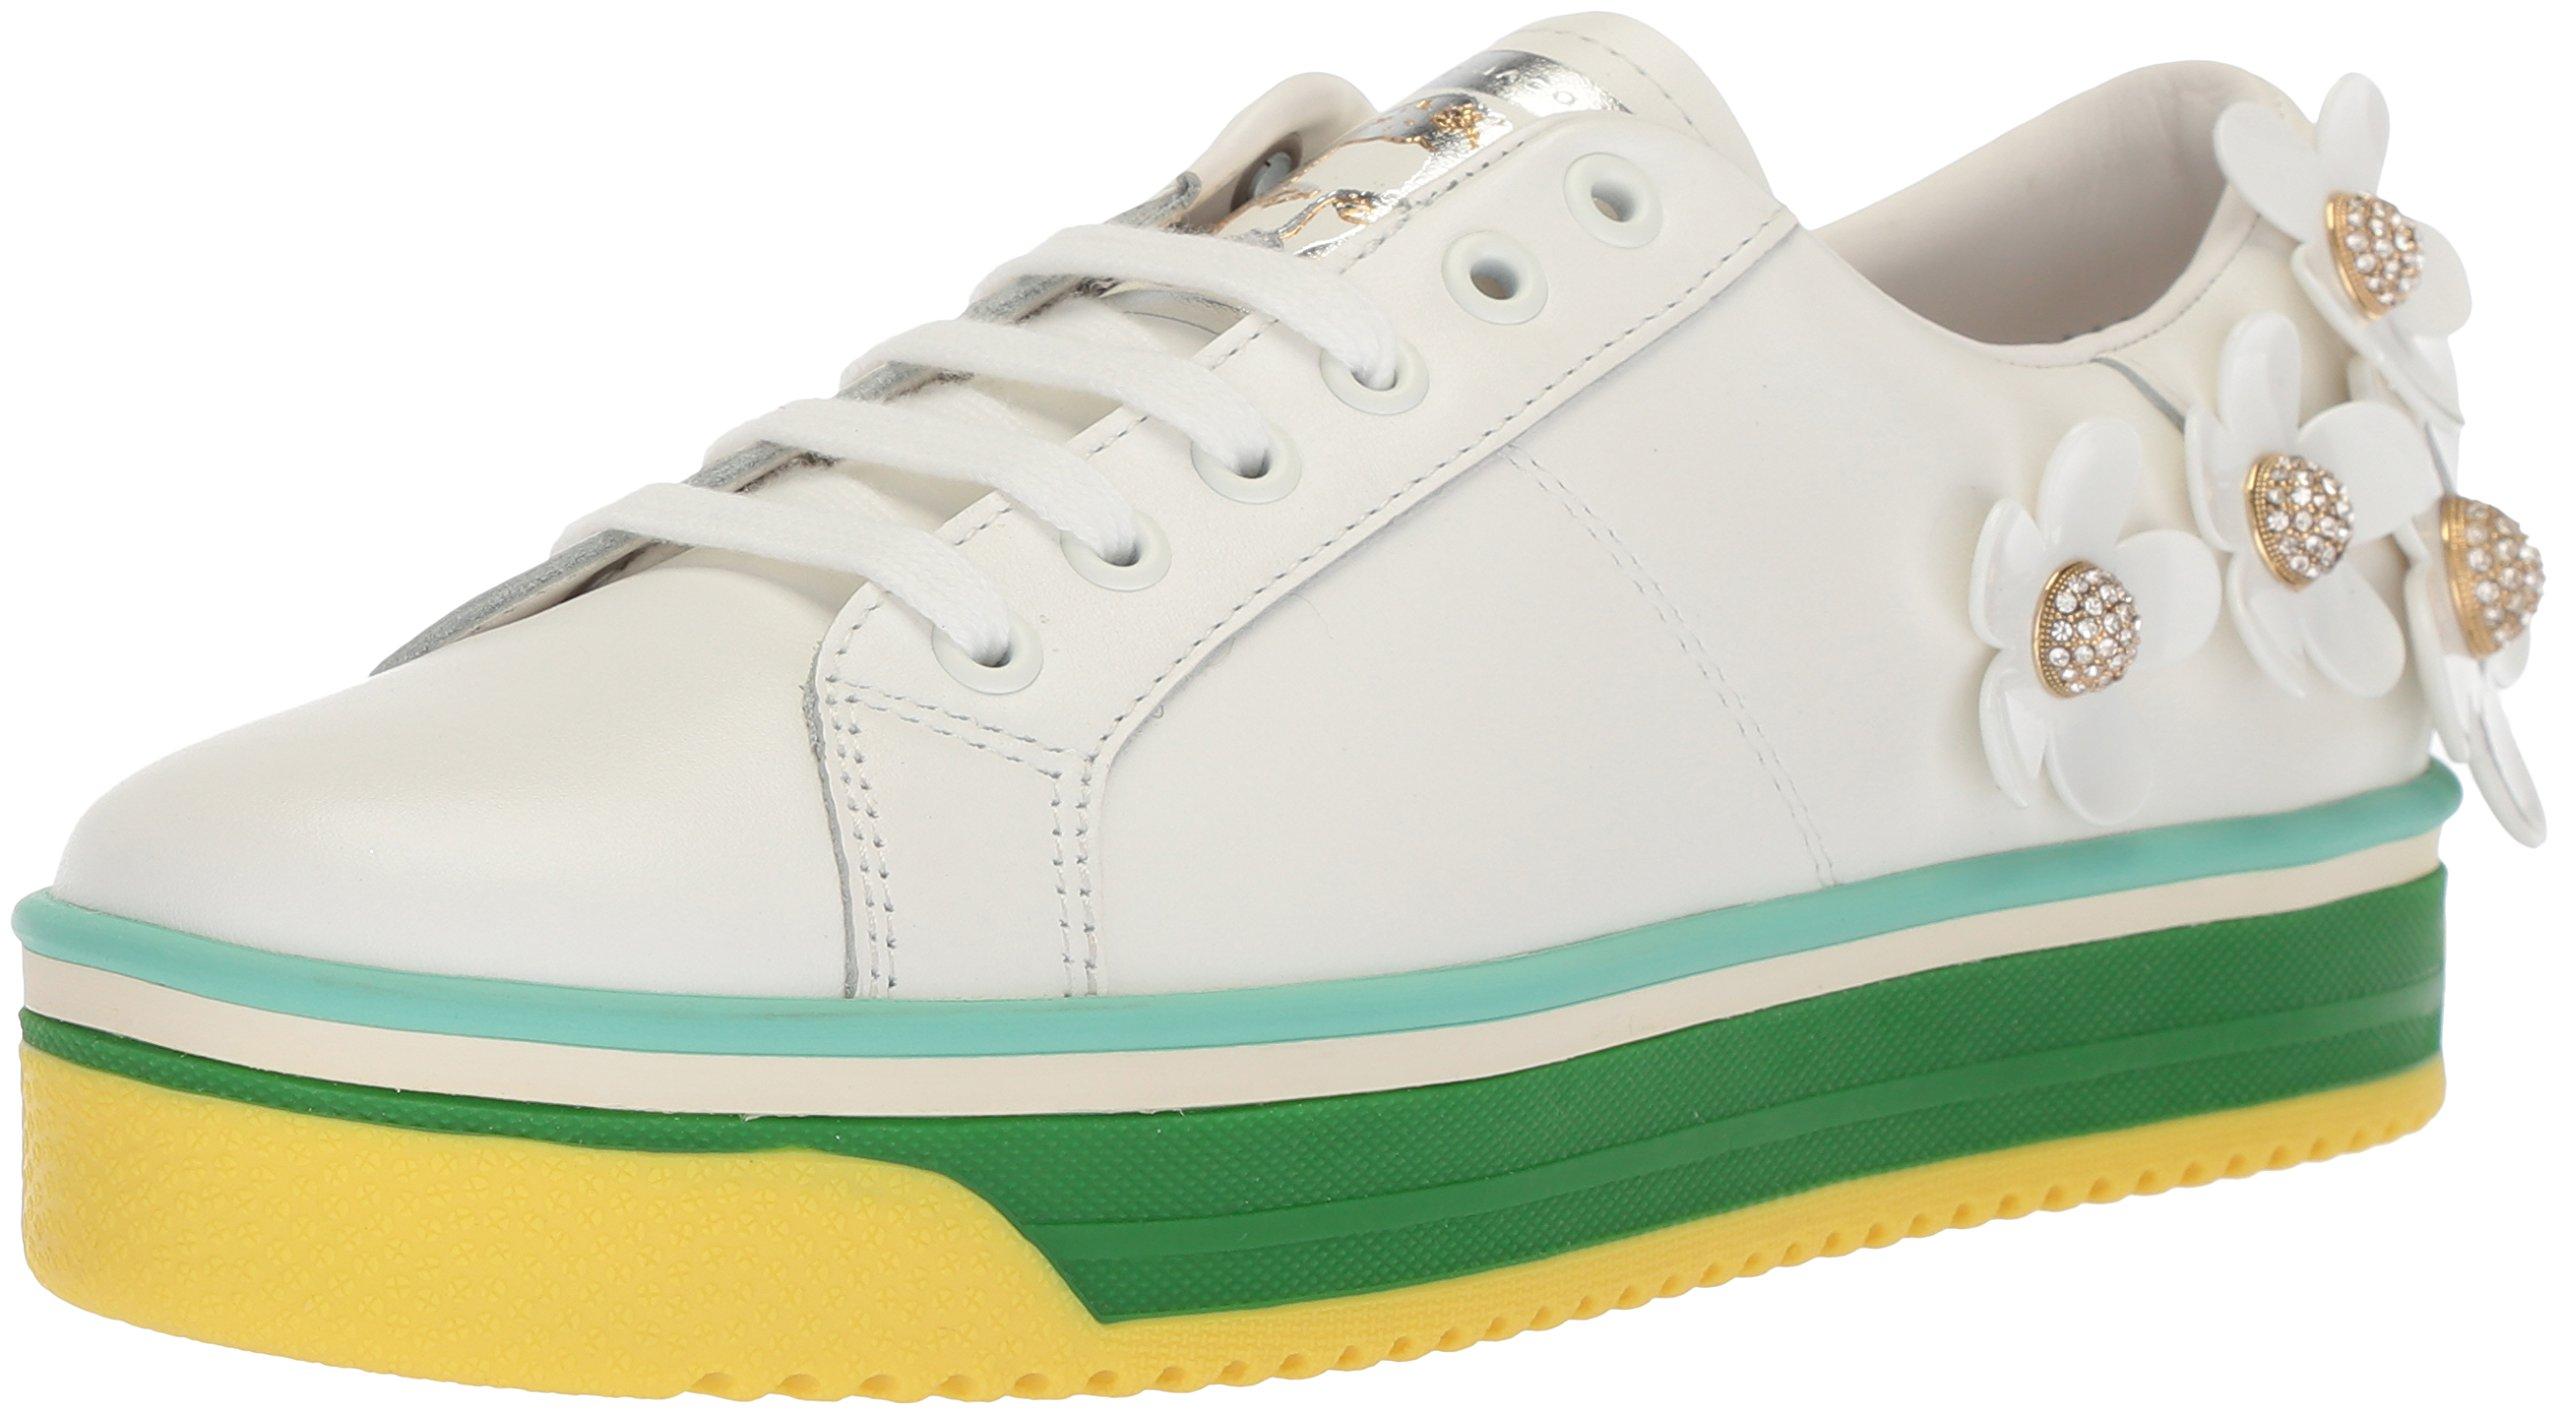 Marc Jacobs Women's Daisy Multi Color Sole Sneaker, White, 37 M EU (7 US)